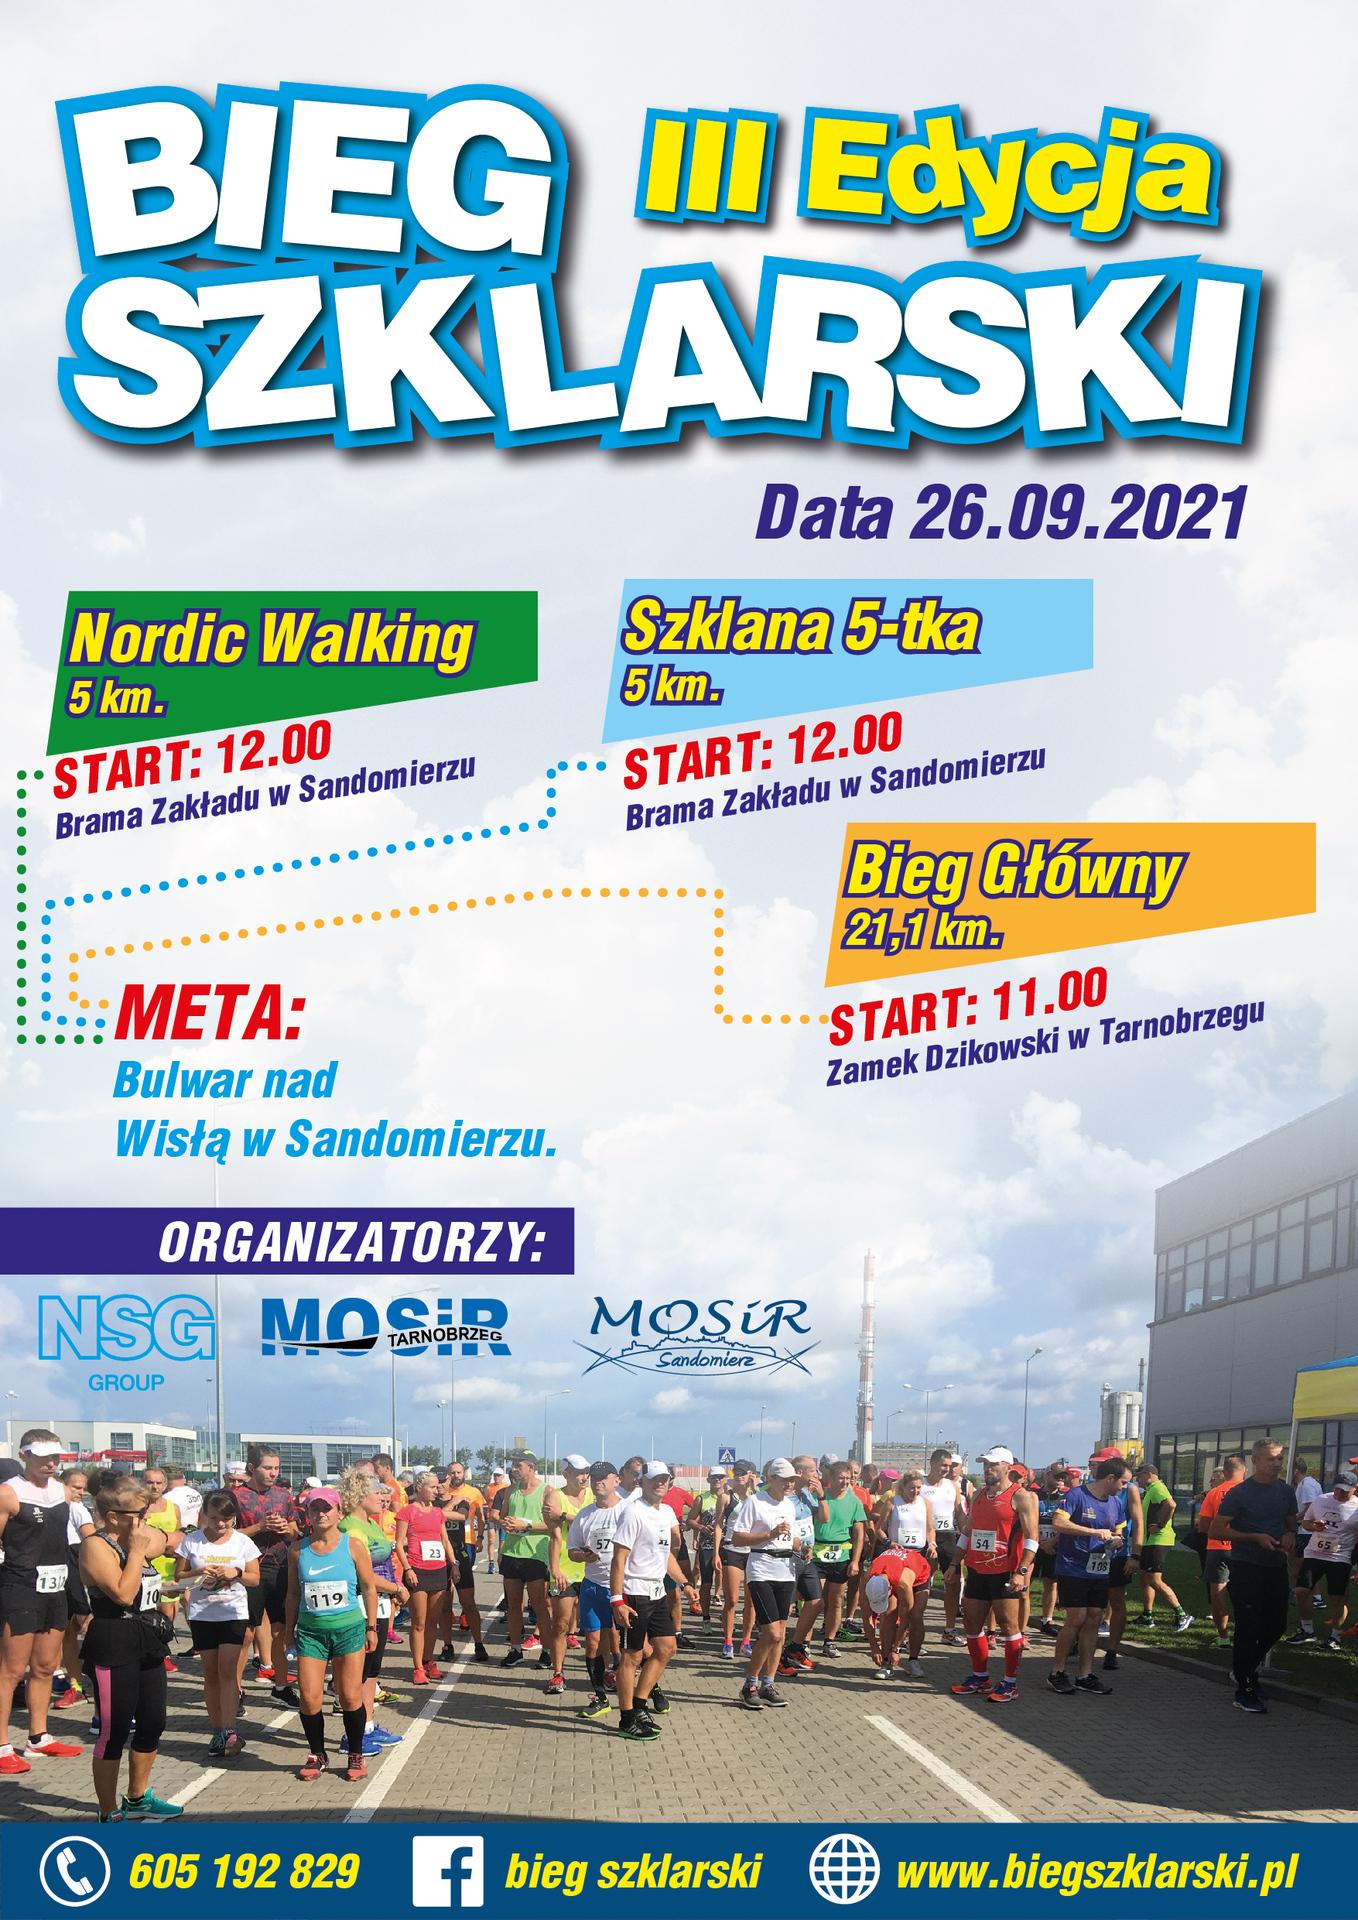 BIEG SZKLARSKI-01.jpeg